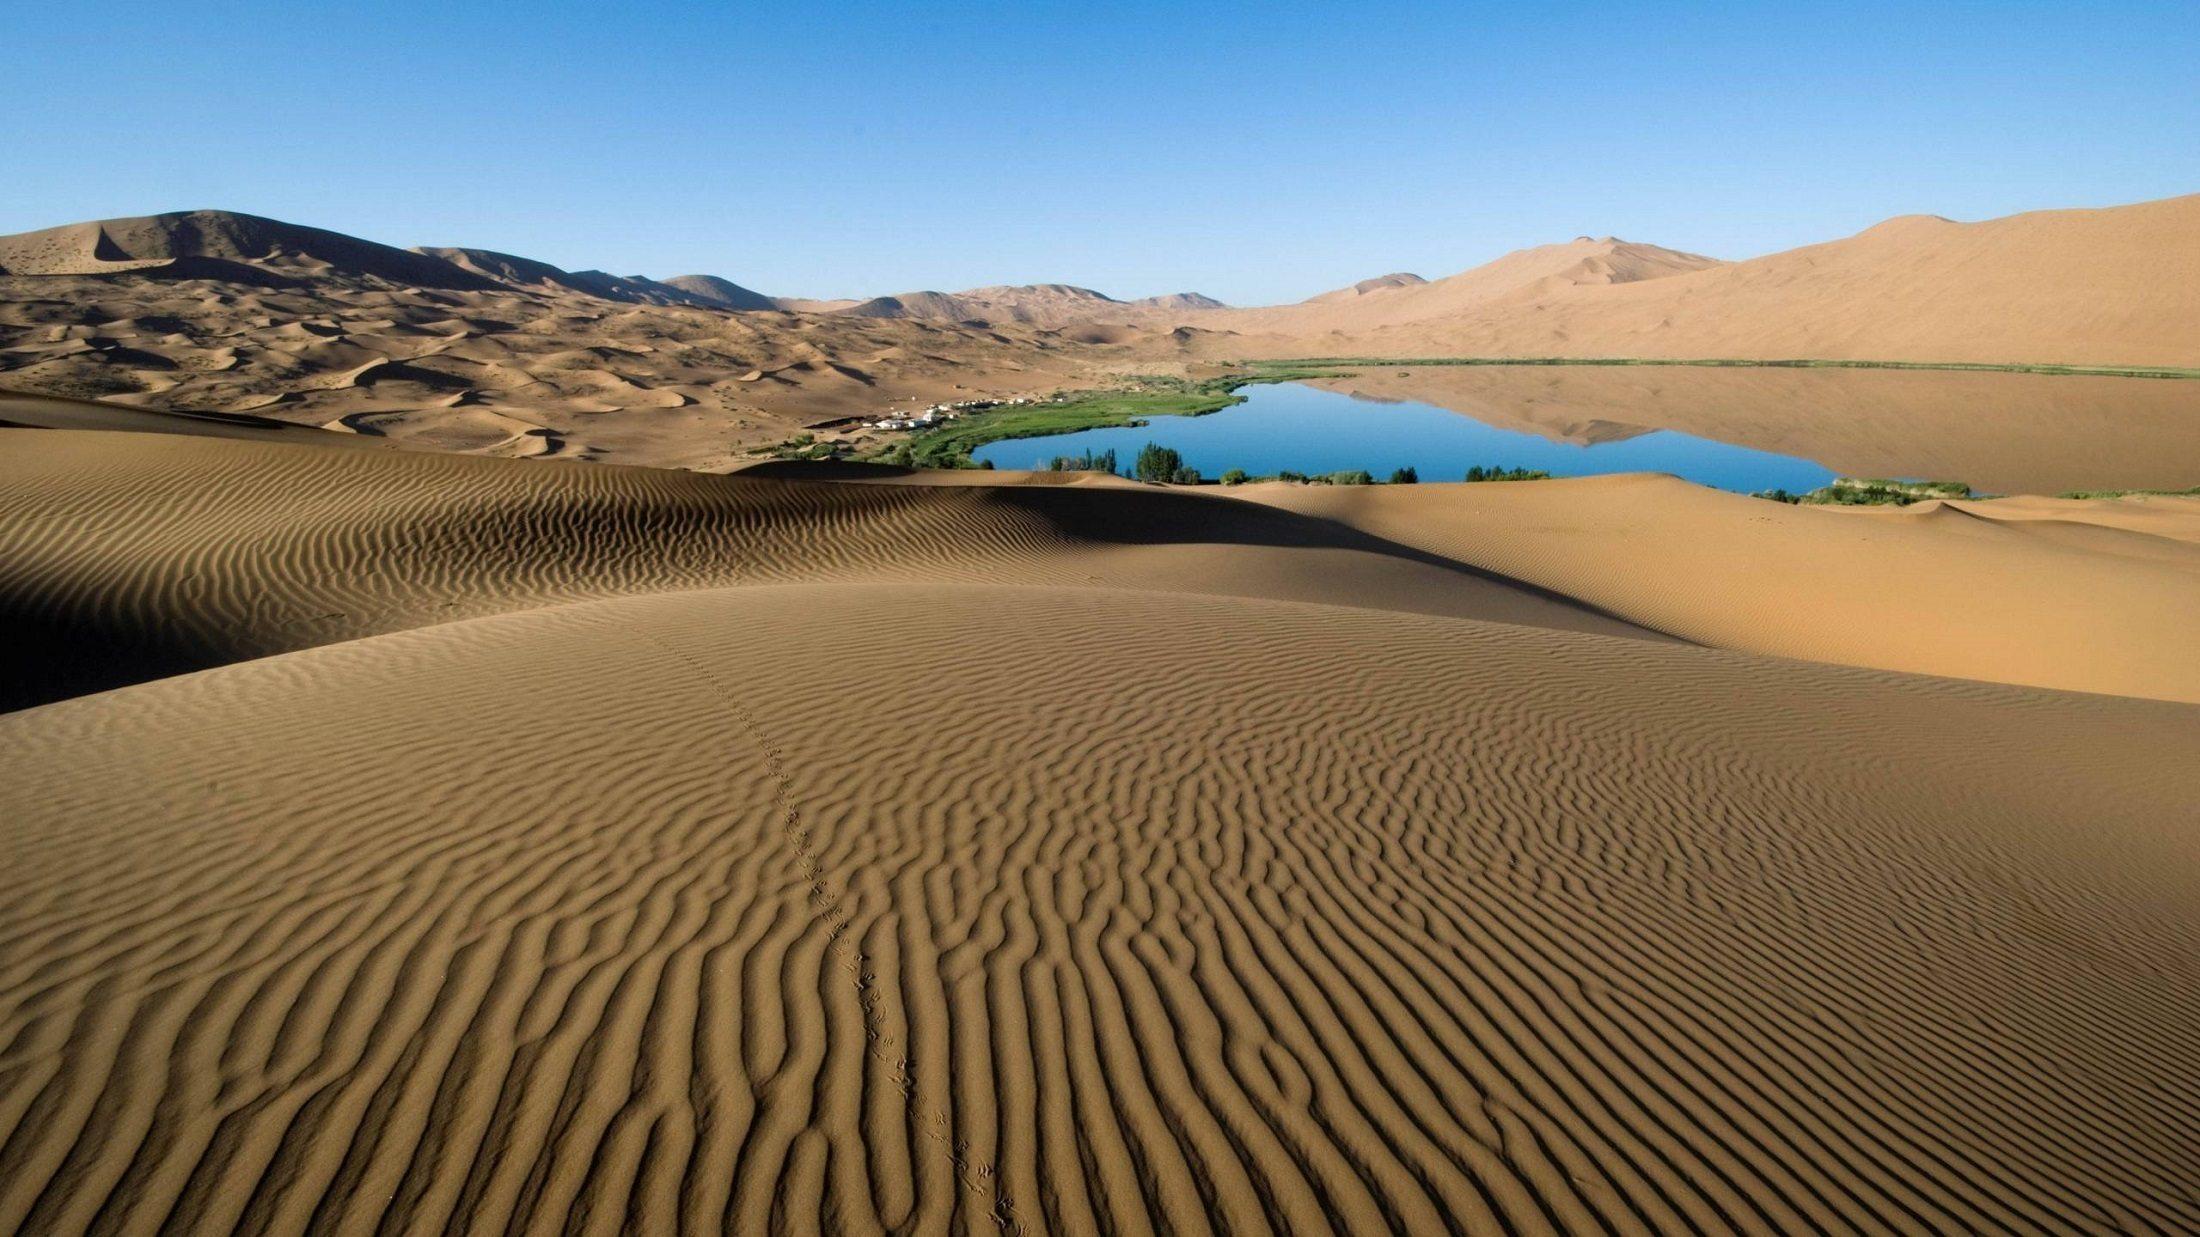 Image:desert paragliding